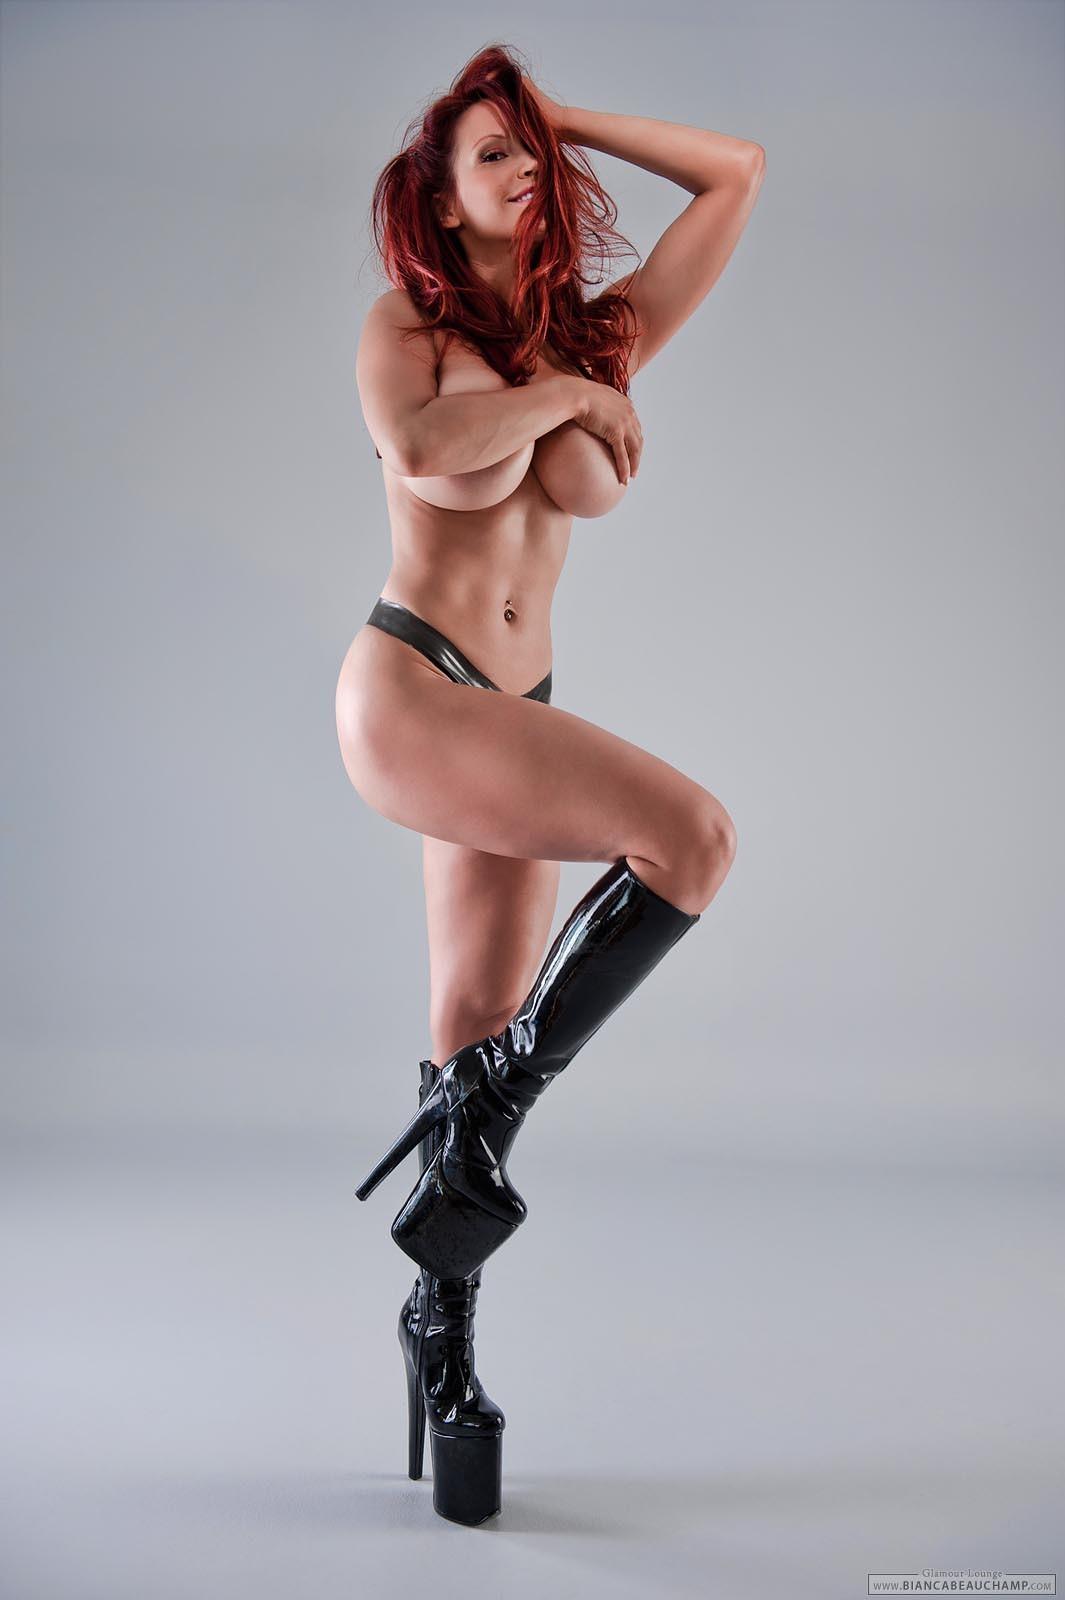 BDSM grandi tette fetish